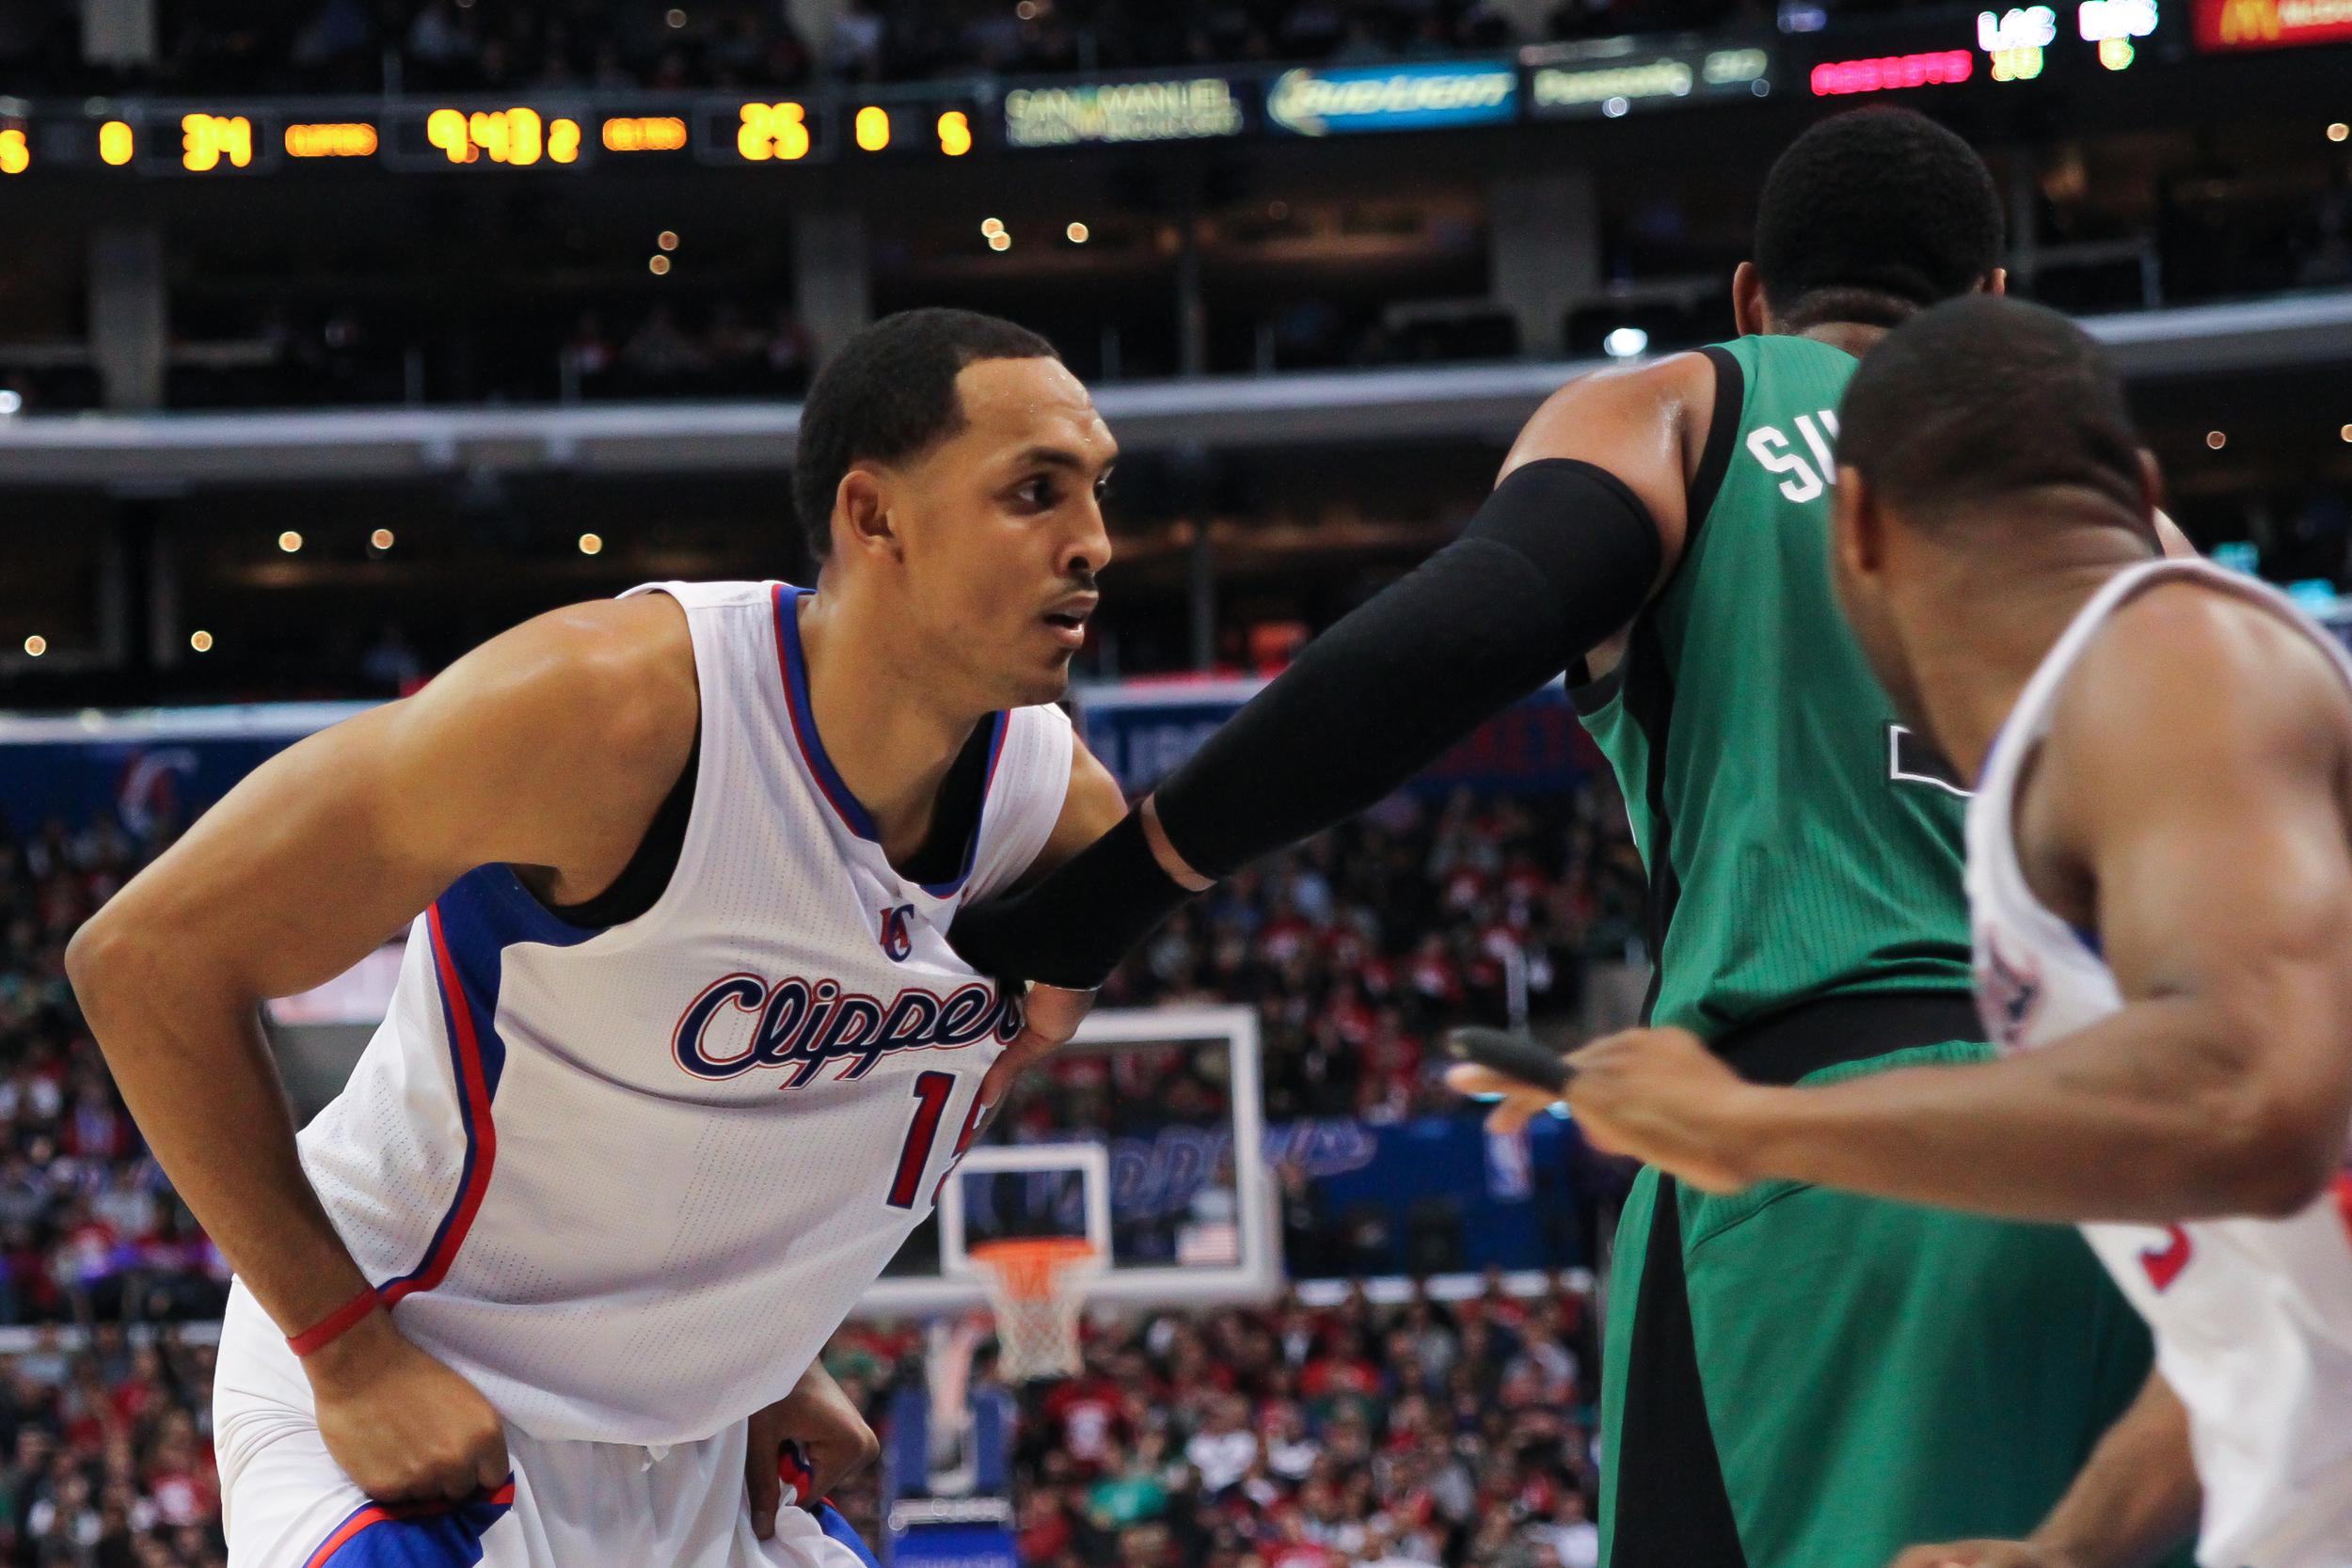 Photo by Varon P. Celtics-26.jpg